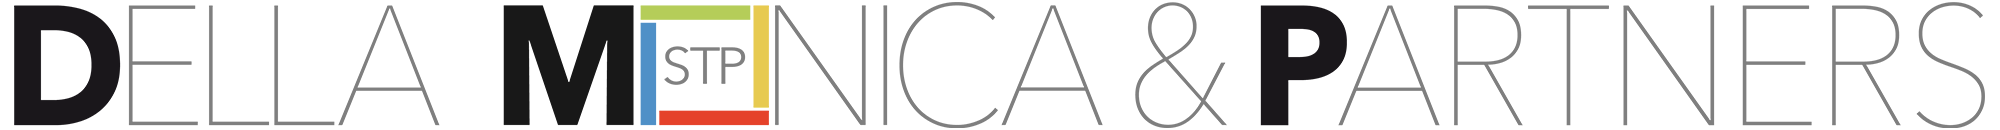 slideshow-dmp-logo-1